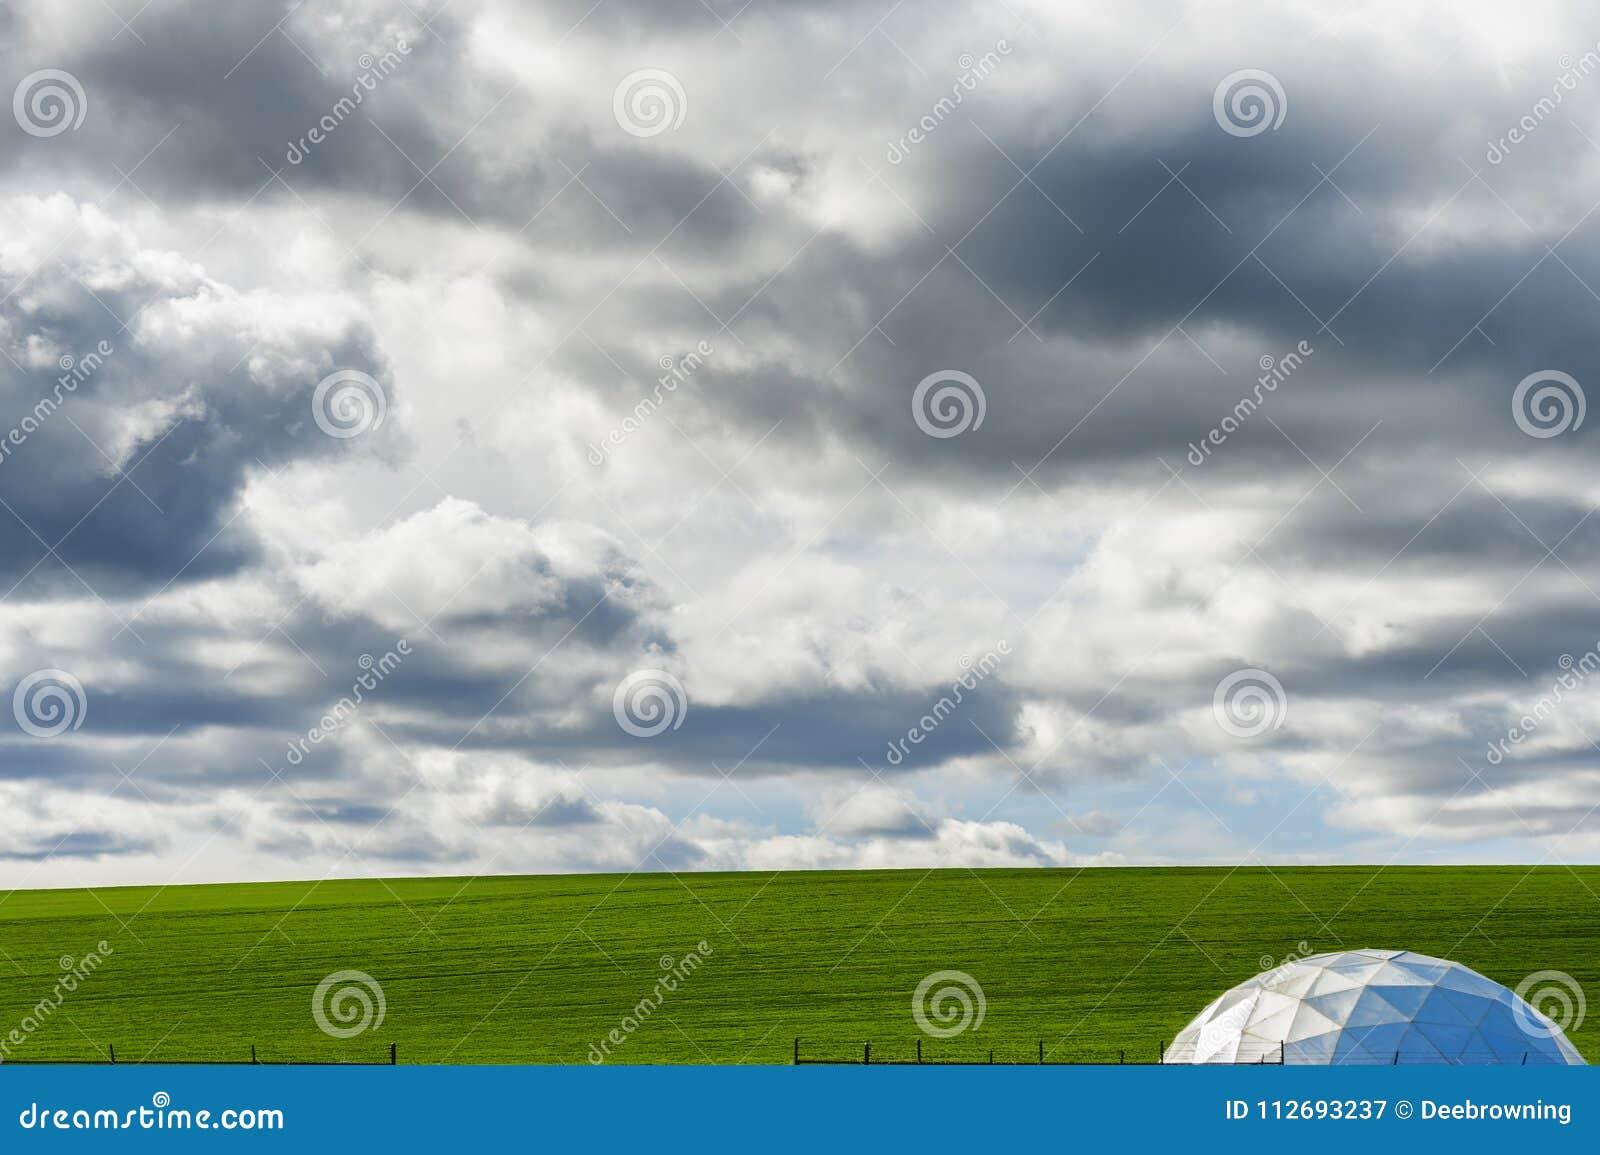 Minimalist Farm Ground Under Big Sky Stock Image Image Of